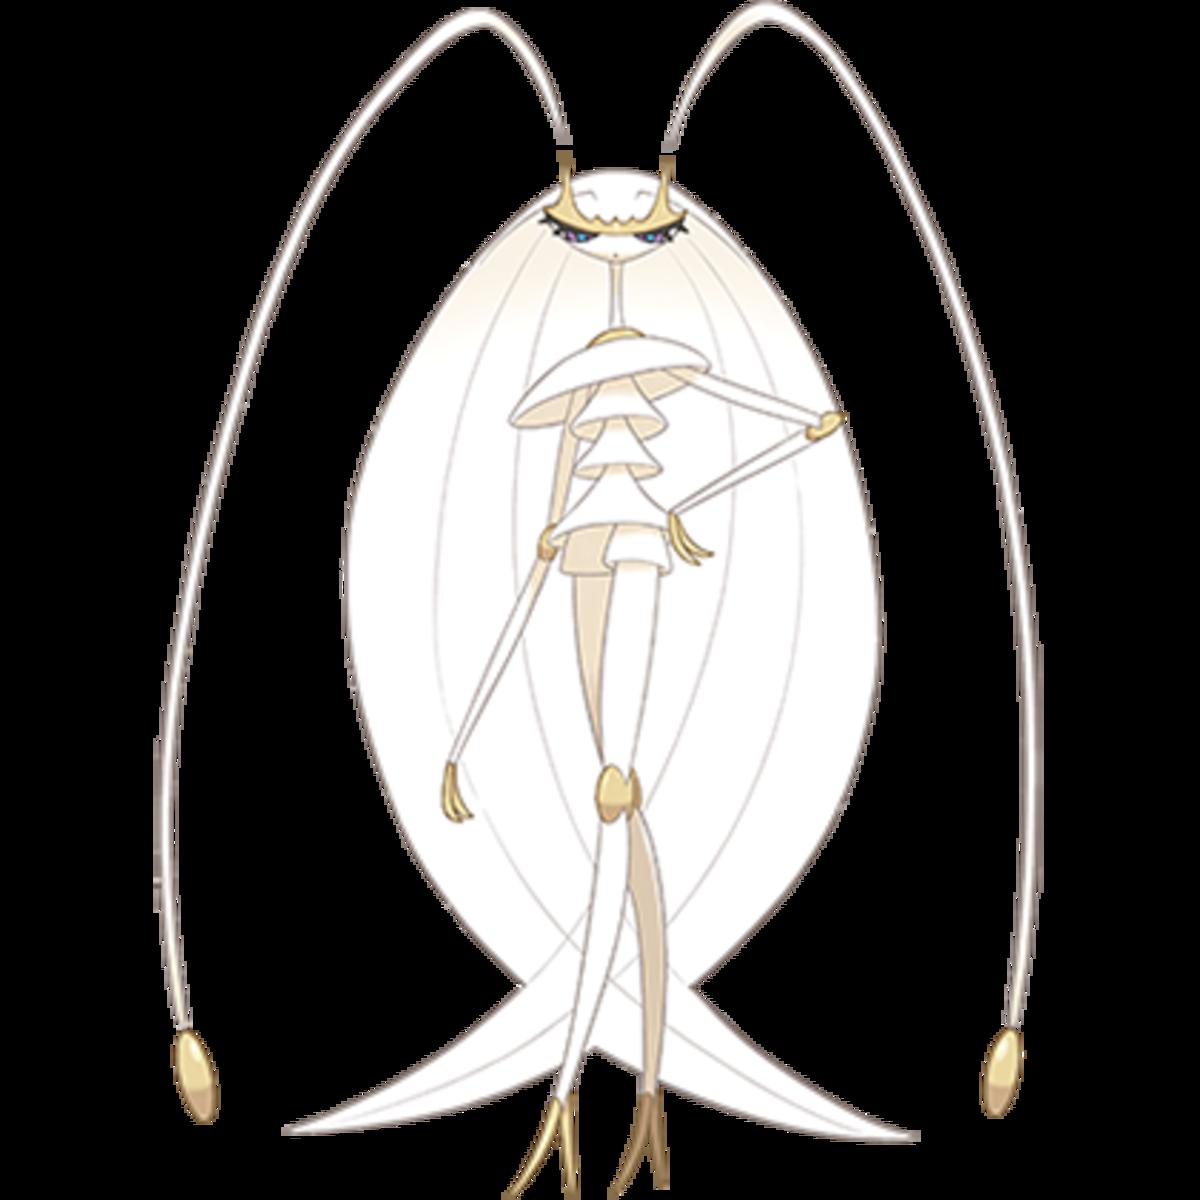 Pheromosa (UB-02 Beauty)